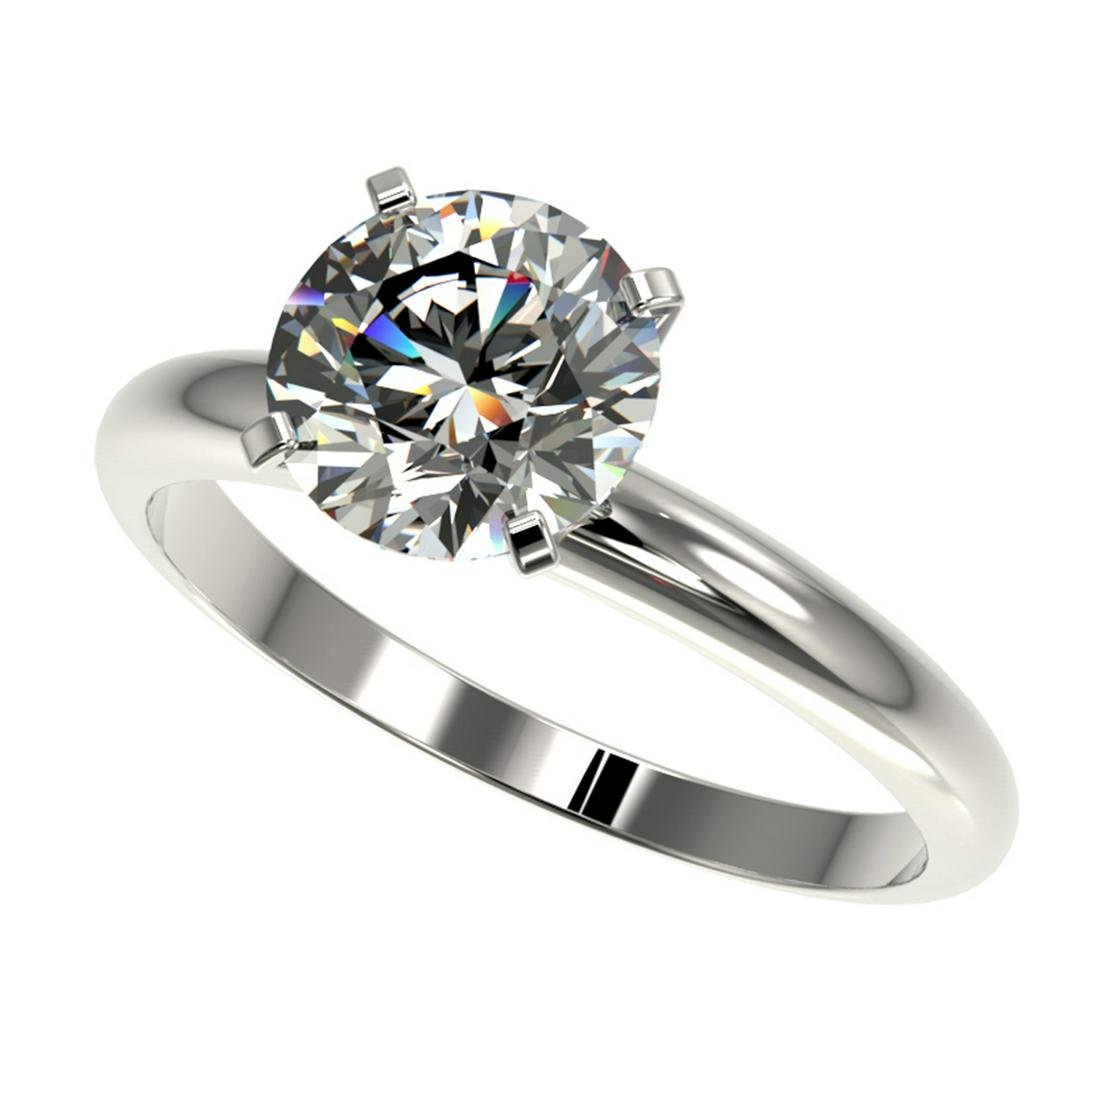 2.03 ctw H-SI/I Diamond Ring 10K White Gold -